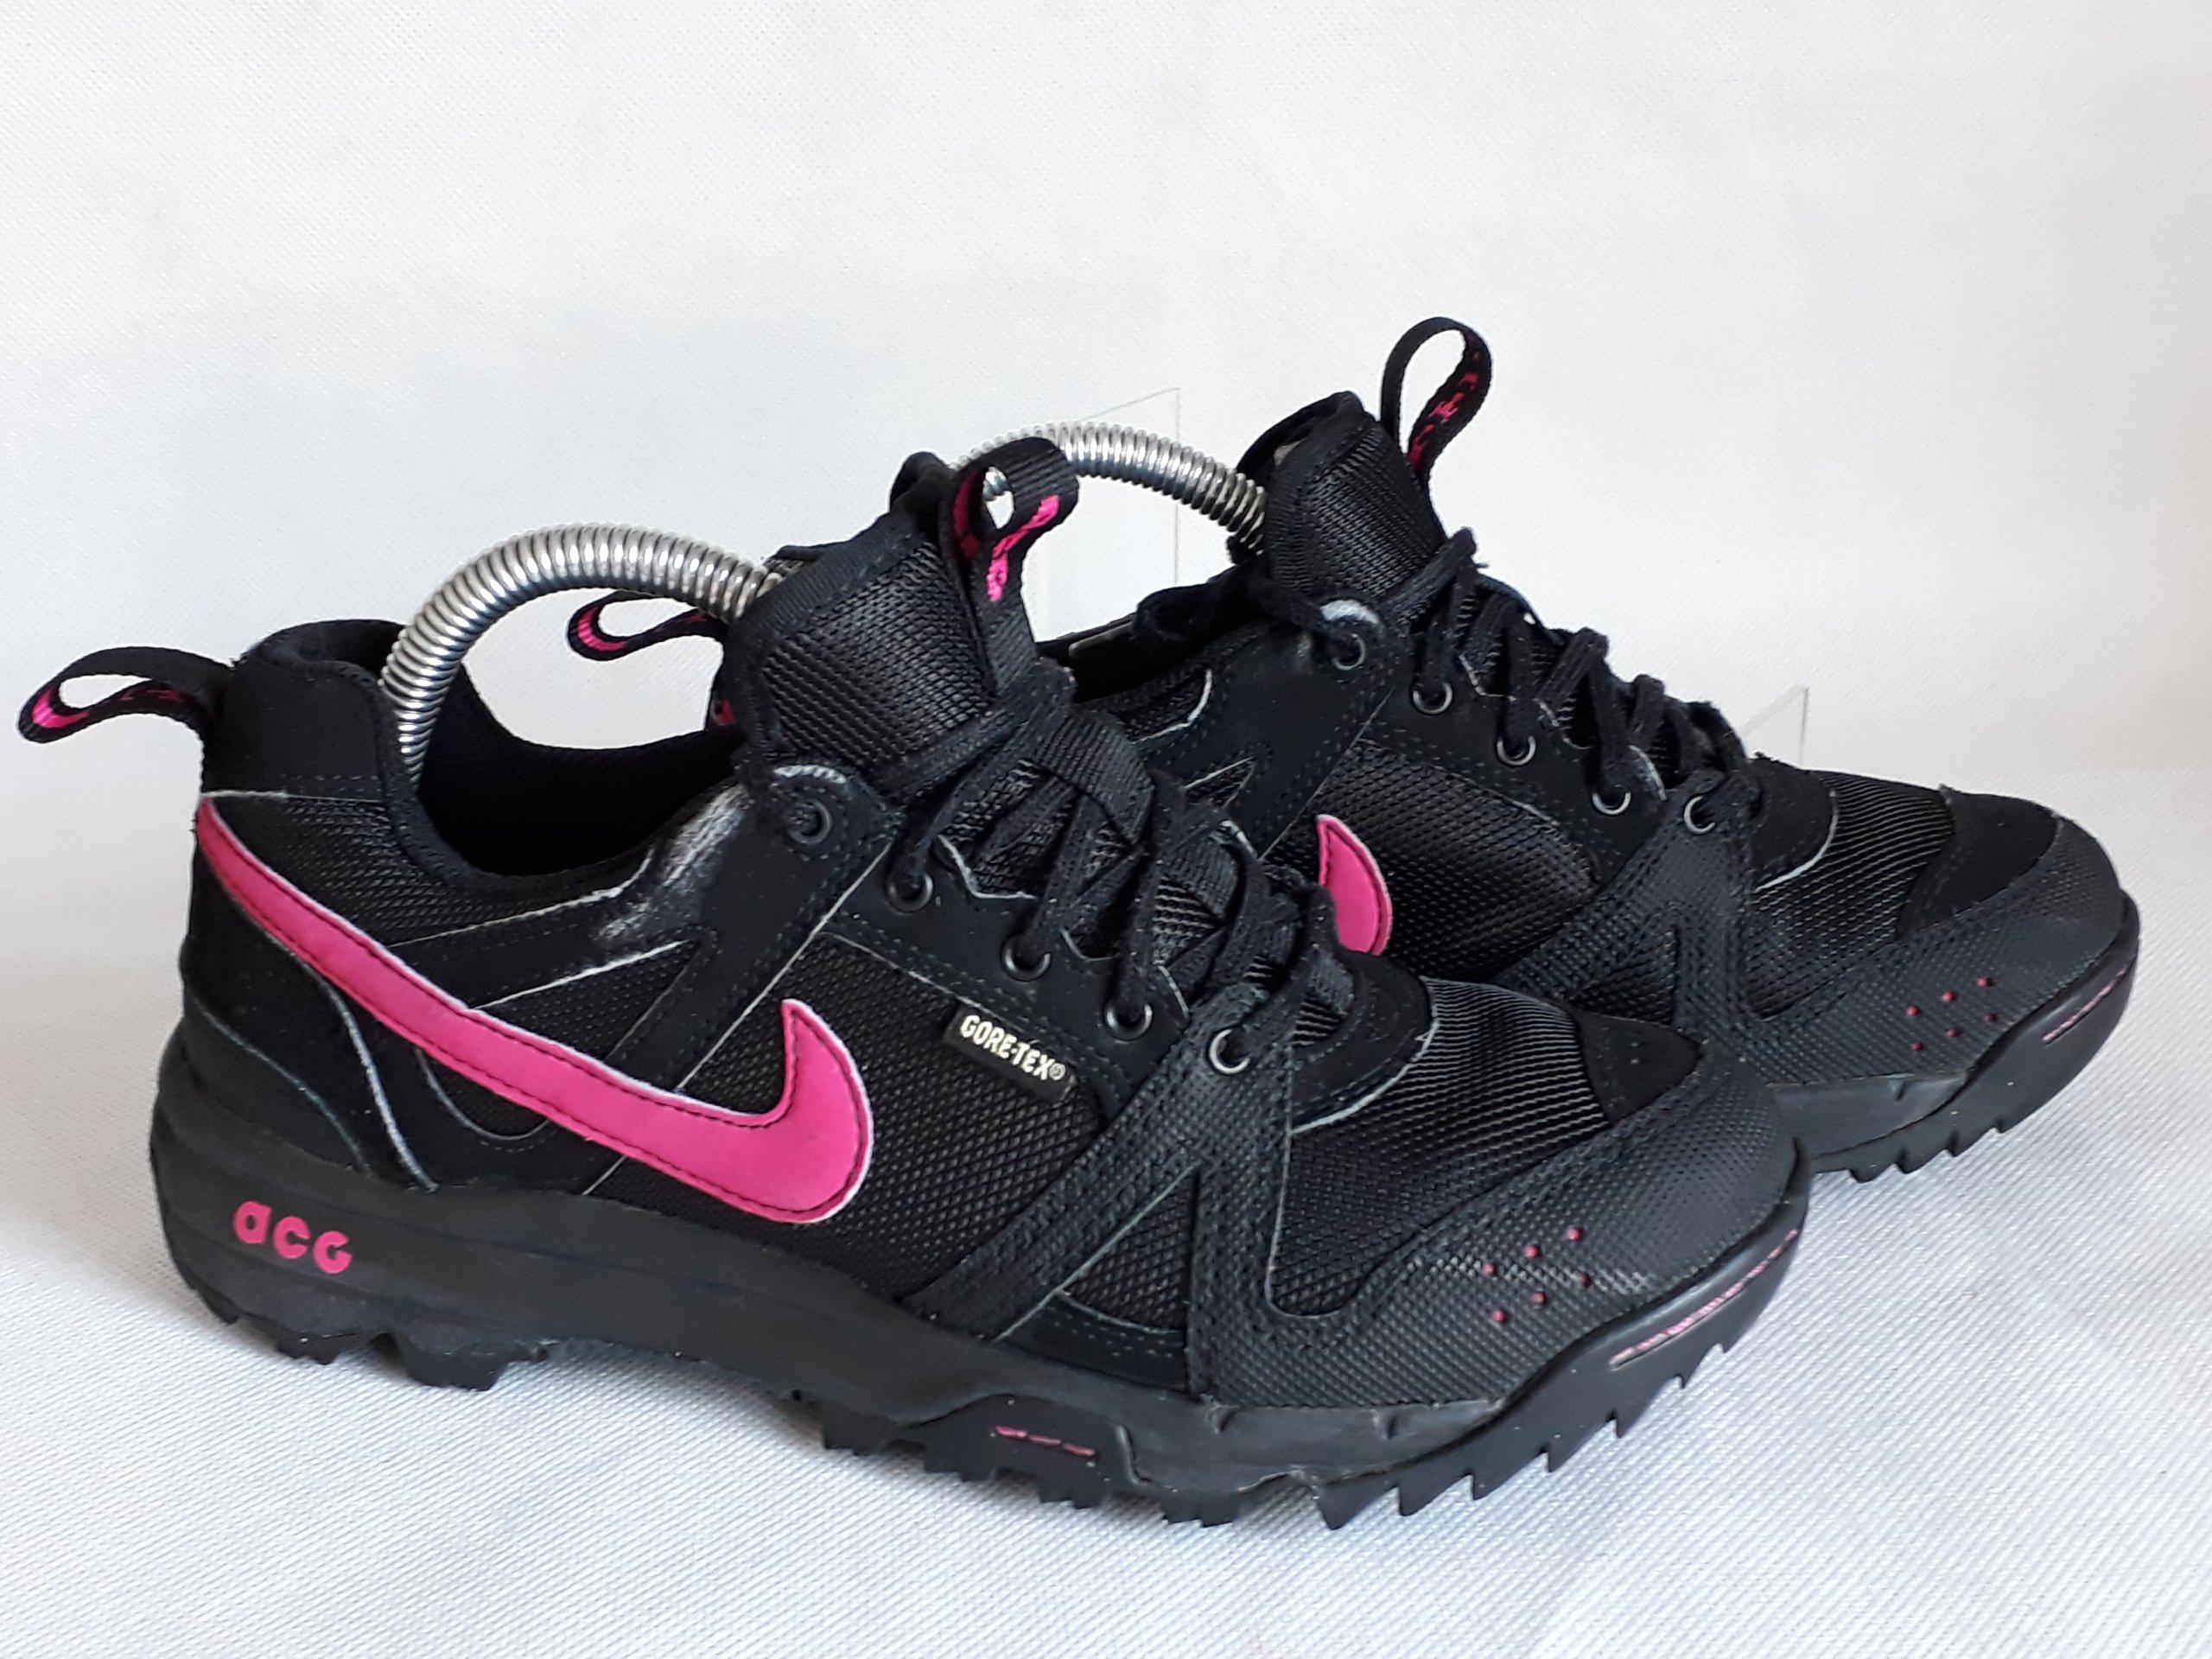 7174922629 Damskie 38 Acg Gore R Tex buty Trekkingowe Nike